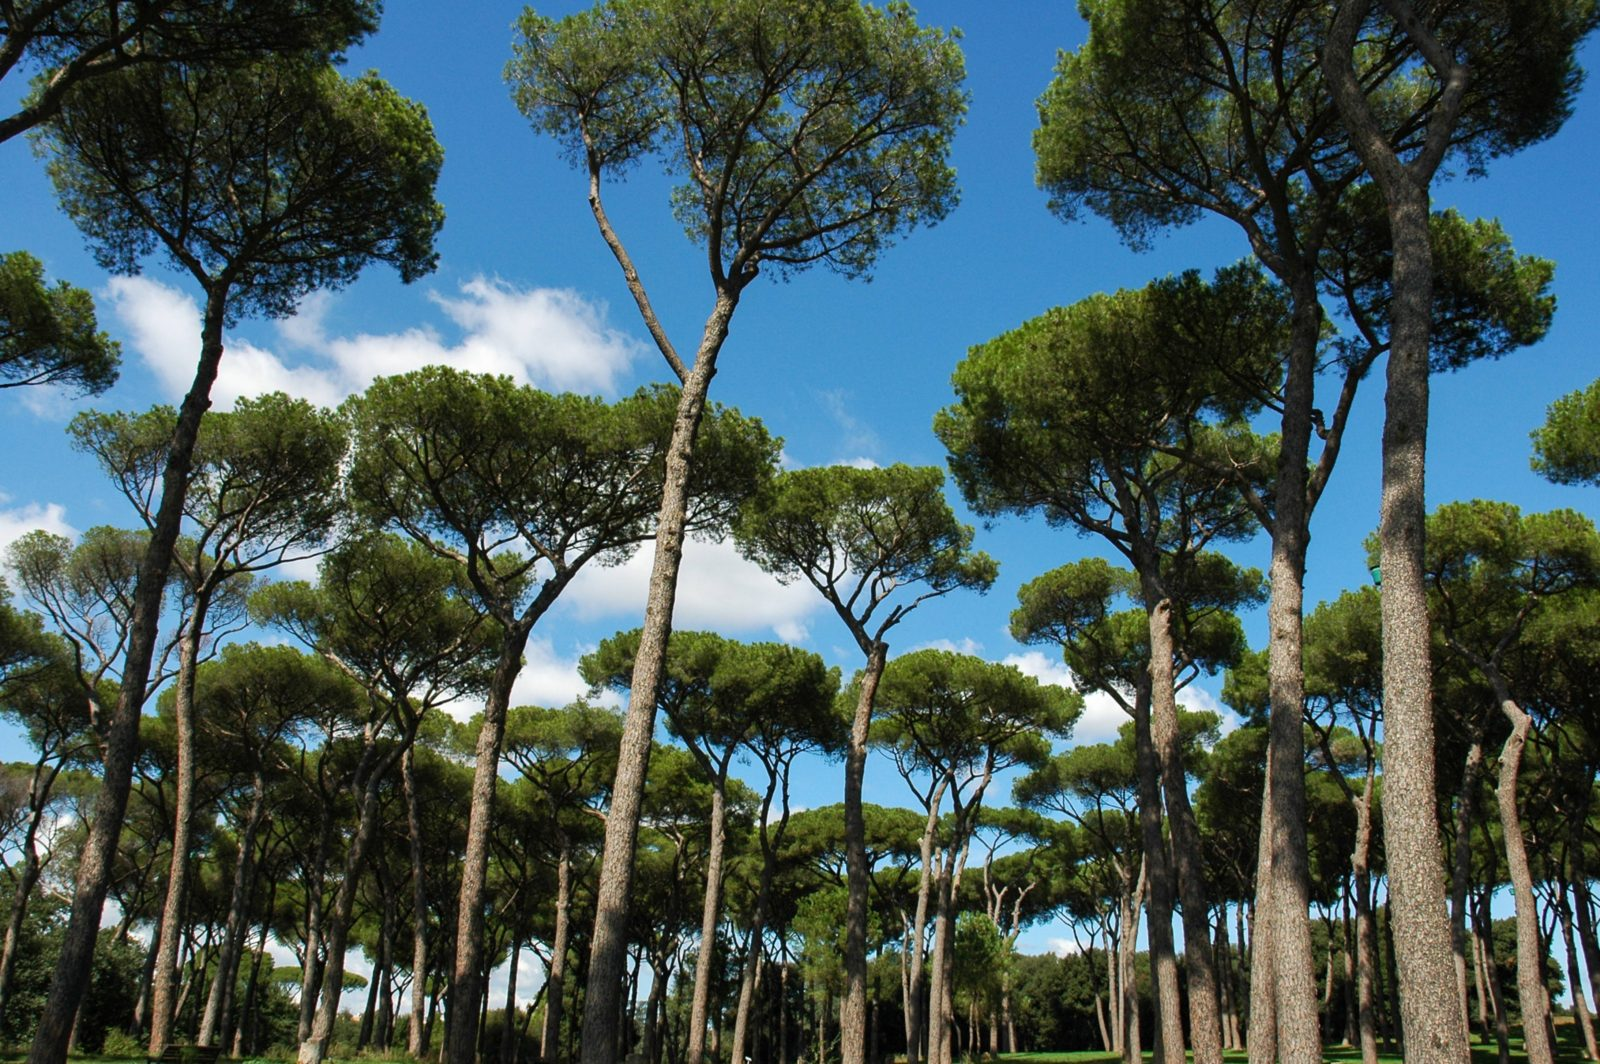 Taking a relaxing walk in Romes Gianicolo Park